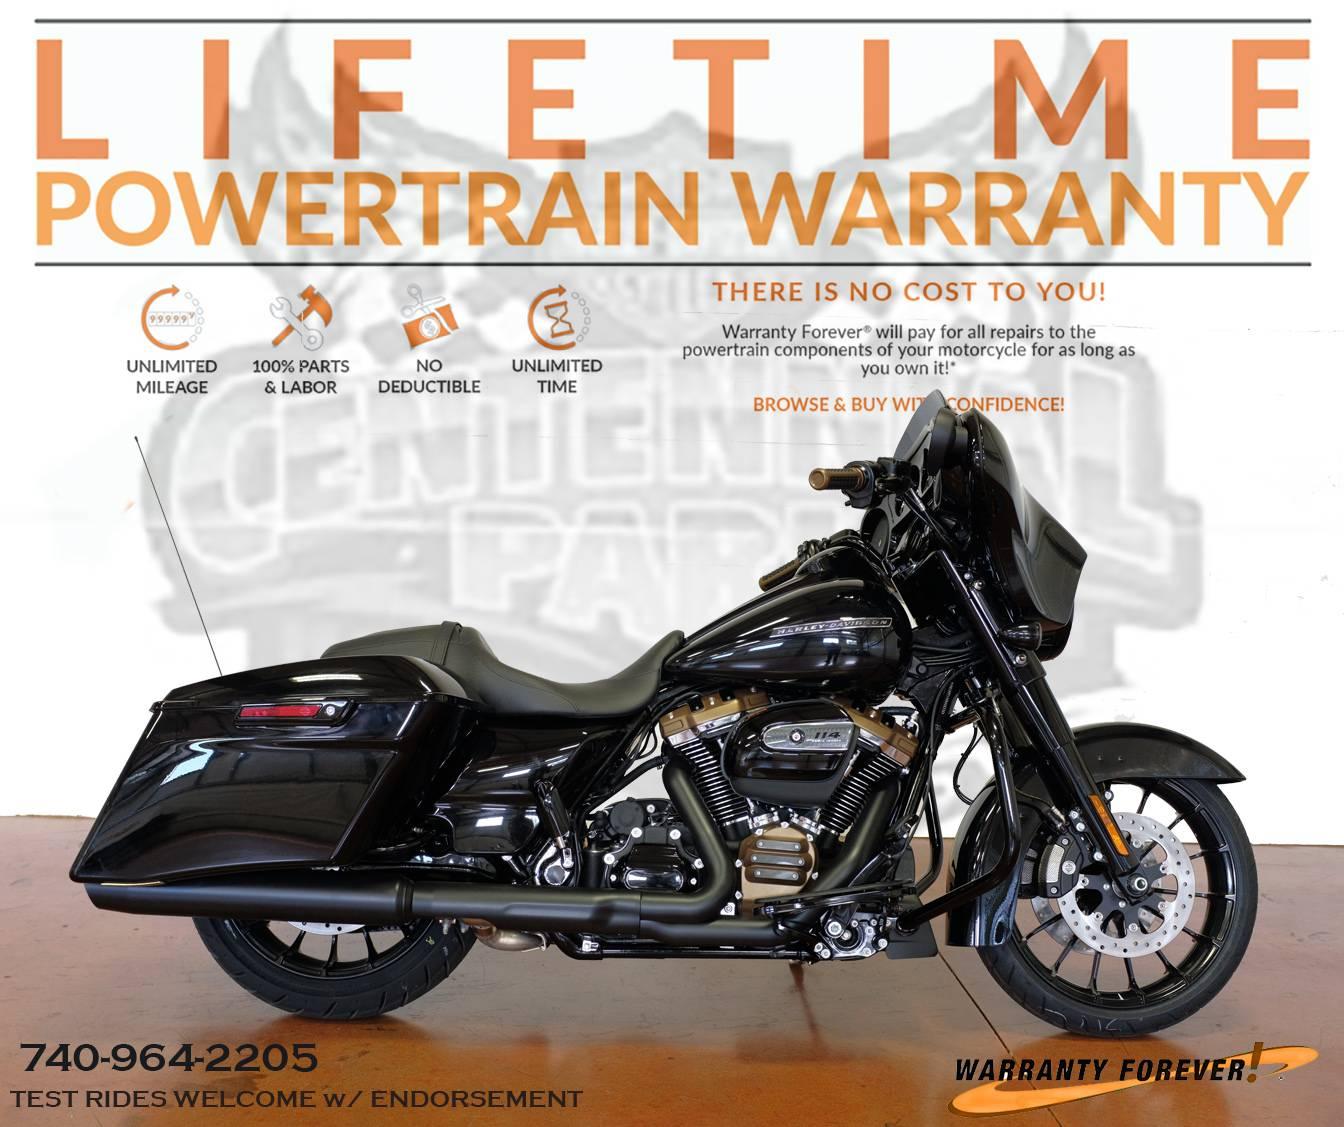 2012 Street Glide Fuse Box Location Just Another Wiring Data Harley Davidson 2019 Special Motorcycles Sunbury Ohio Honda Cr V Diagram